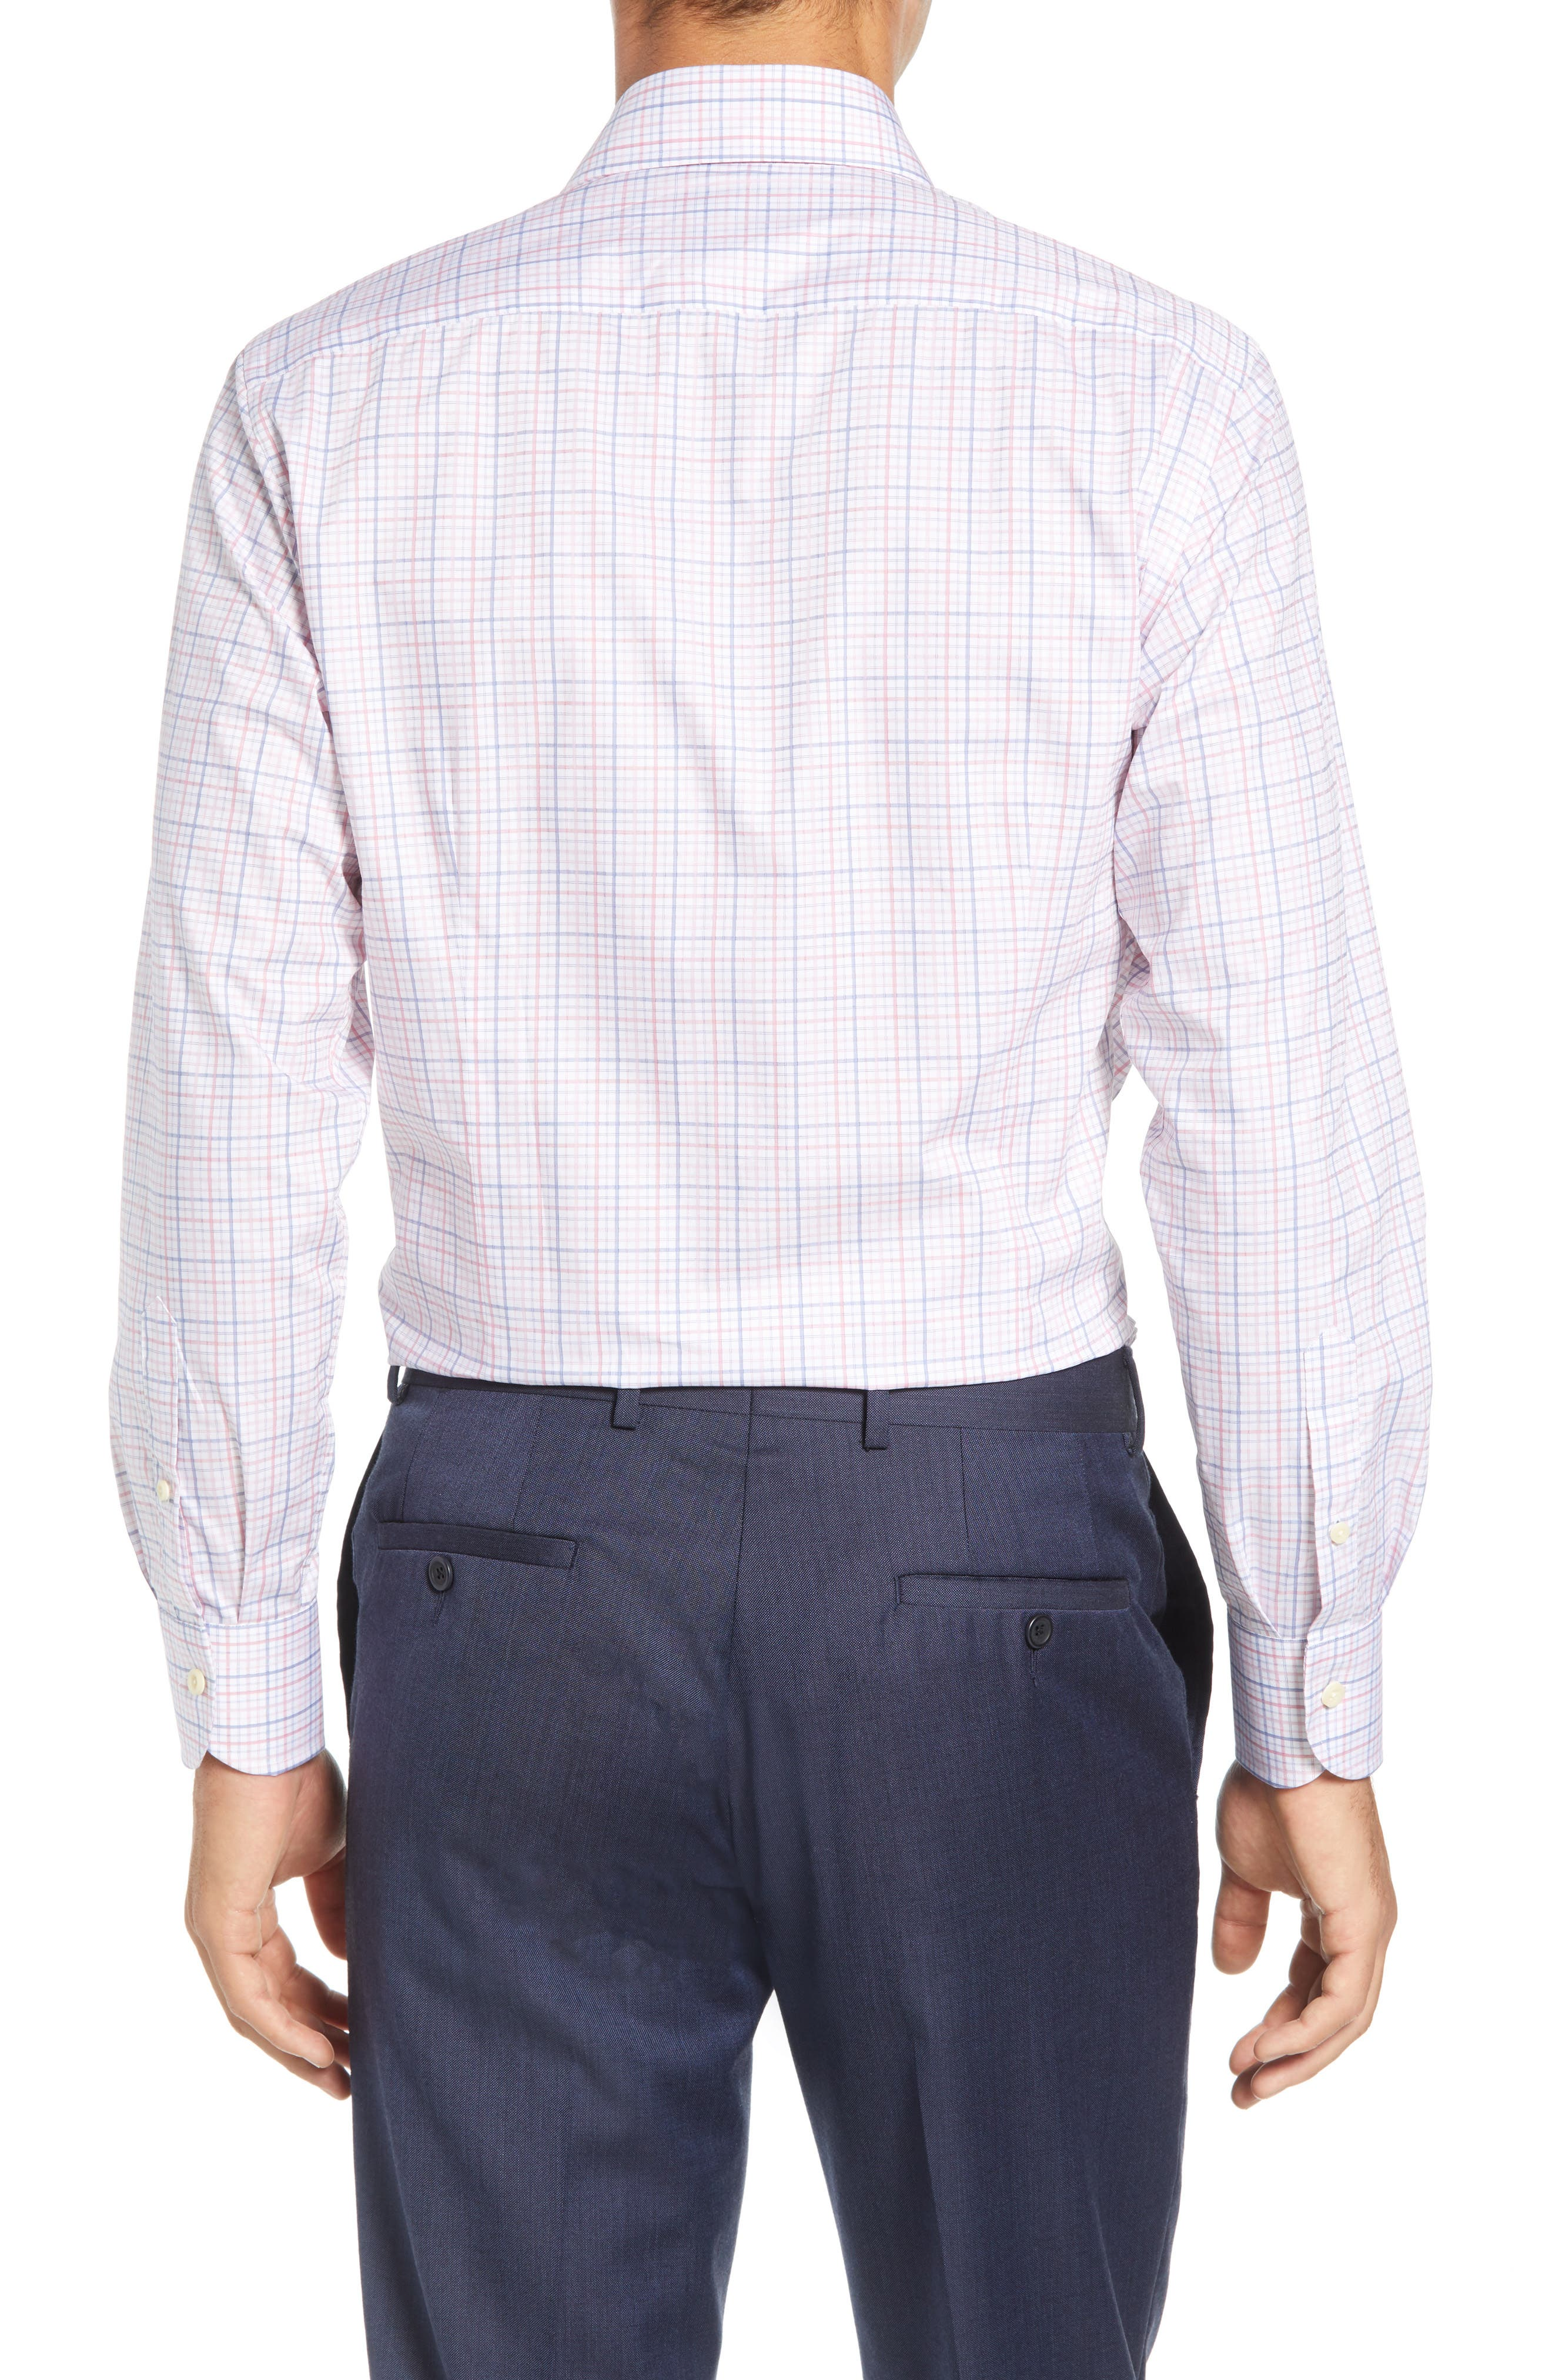 Drazin Trim Fit Check Dress Shirt,                             Alternate thumbnail 3, color,                             PINK